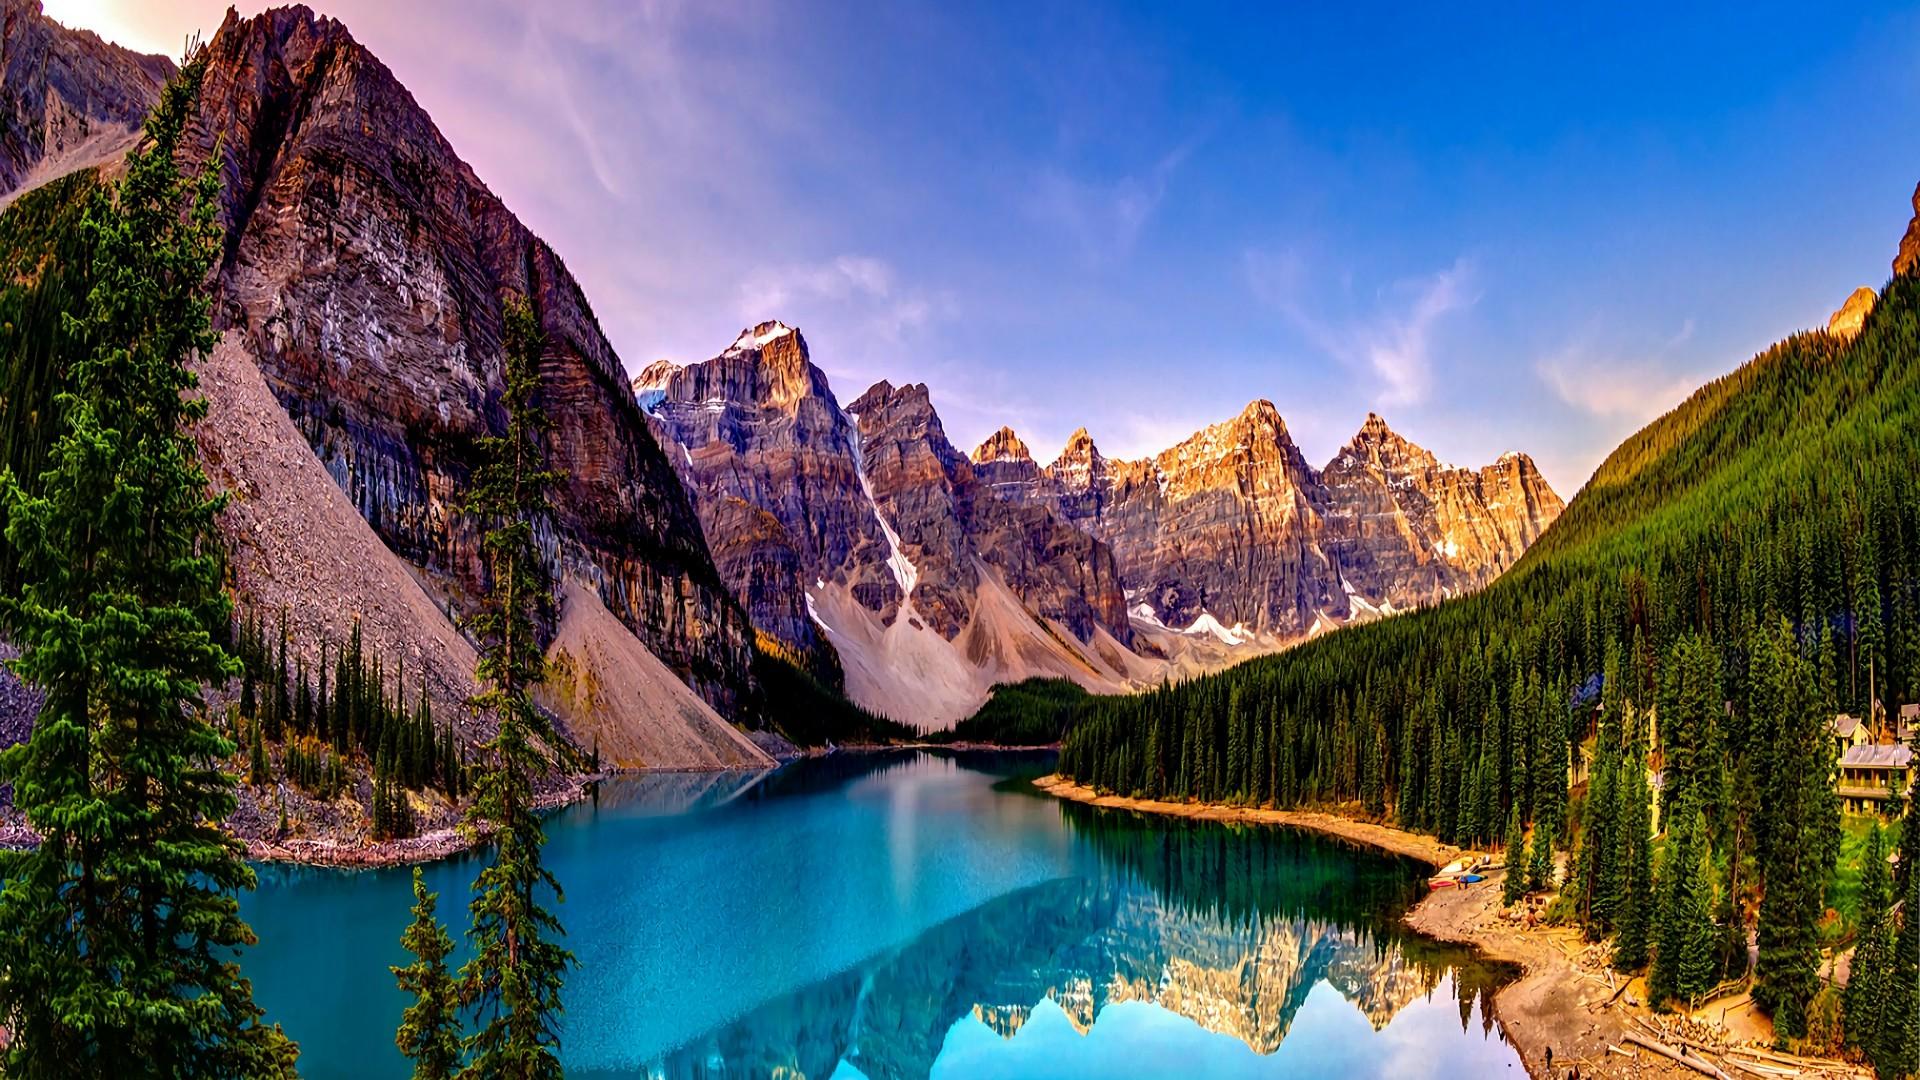 wallpaper cat tumpah,natural landscape,mountain,mountainous landforms,nature,wilderness